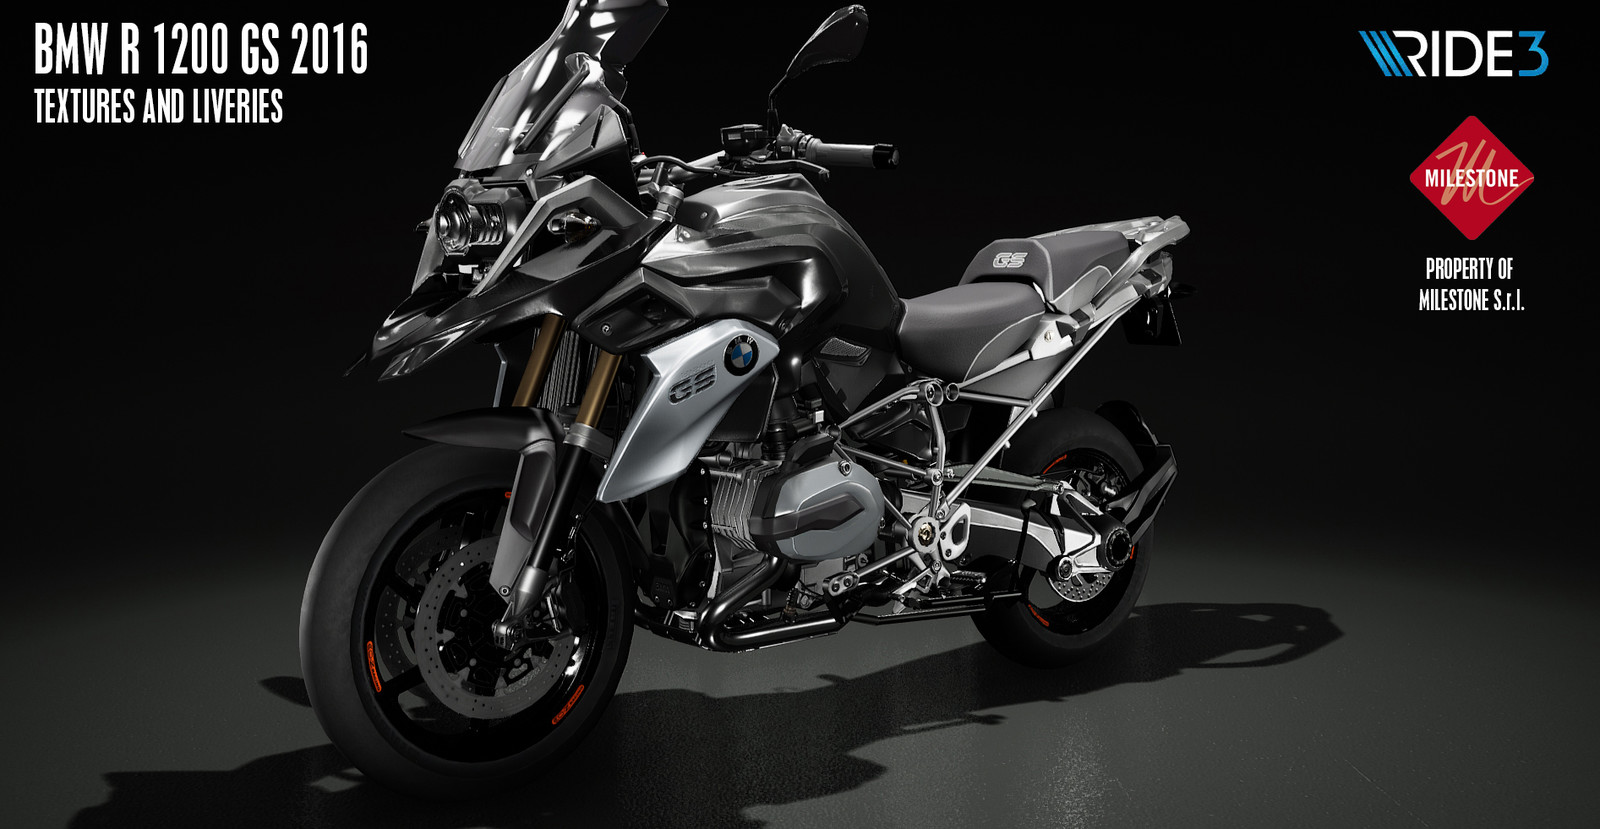 Ride 3 - BMW R 1200 GS 2016